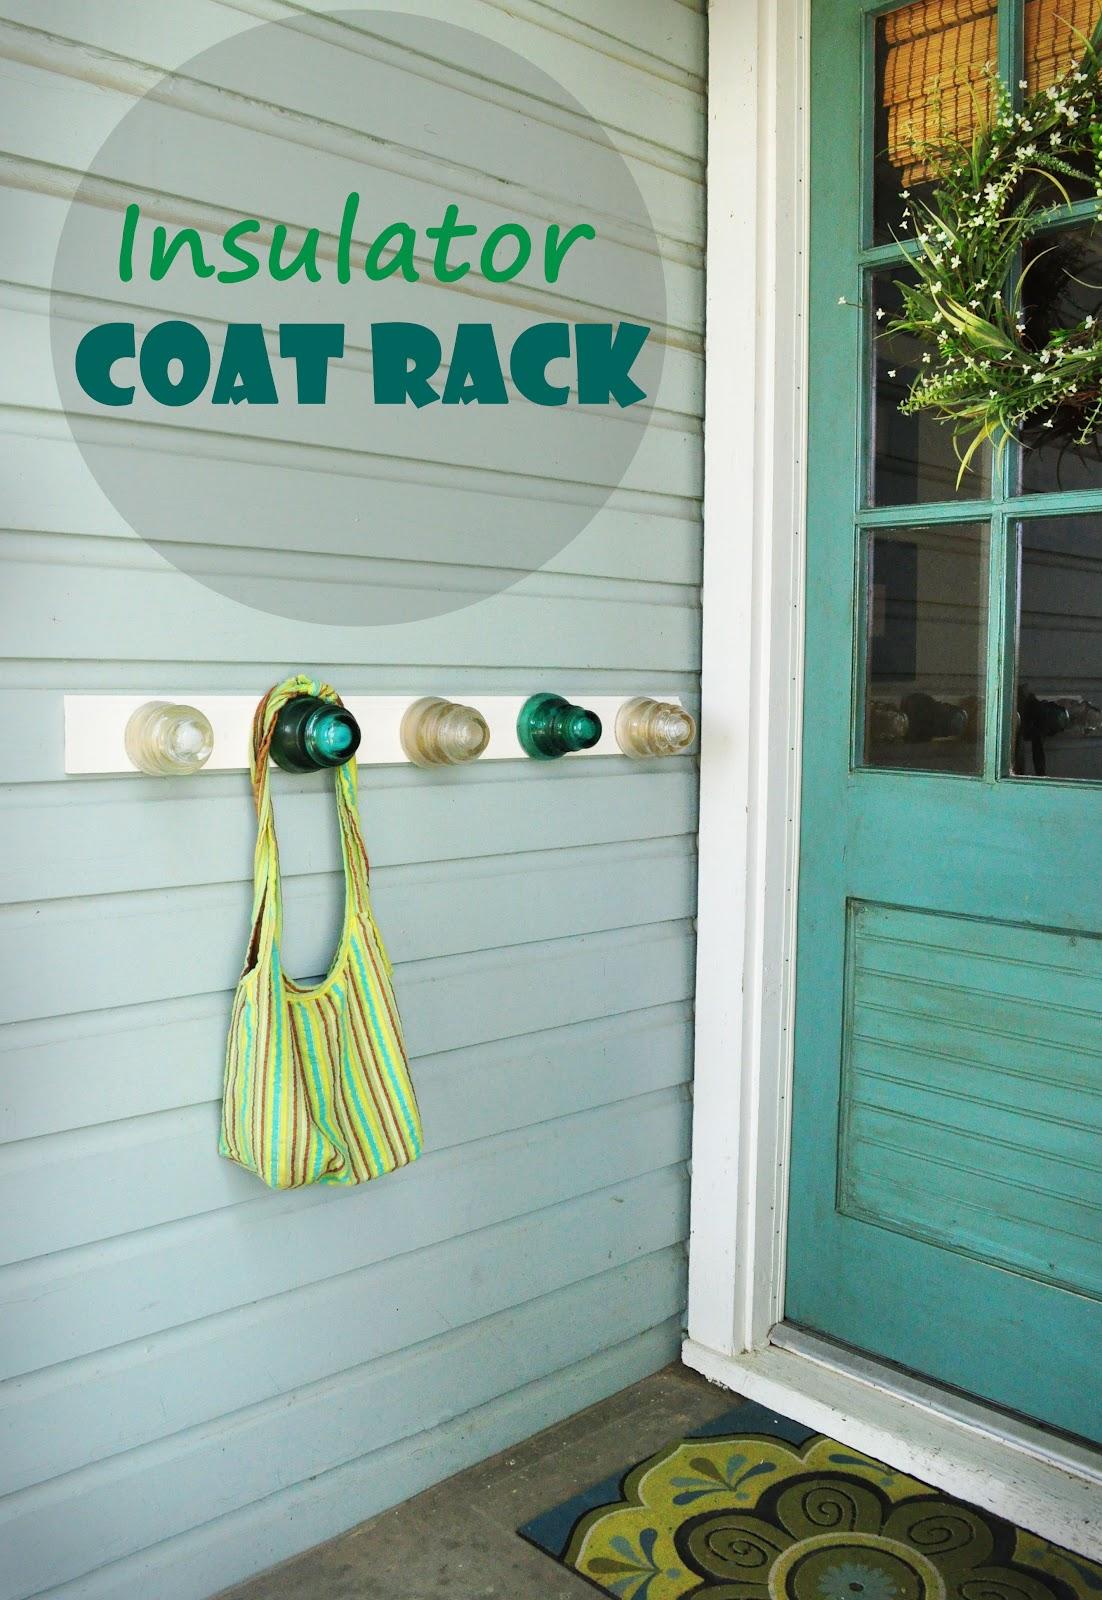 Insulator coat rack creatively living blog for Glass electric insulator crafts